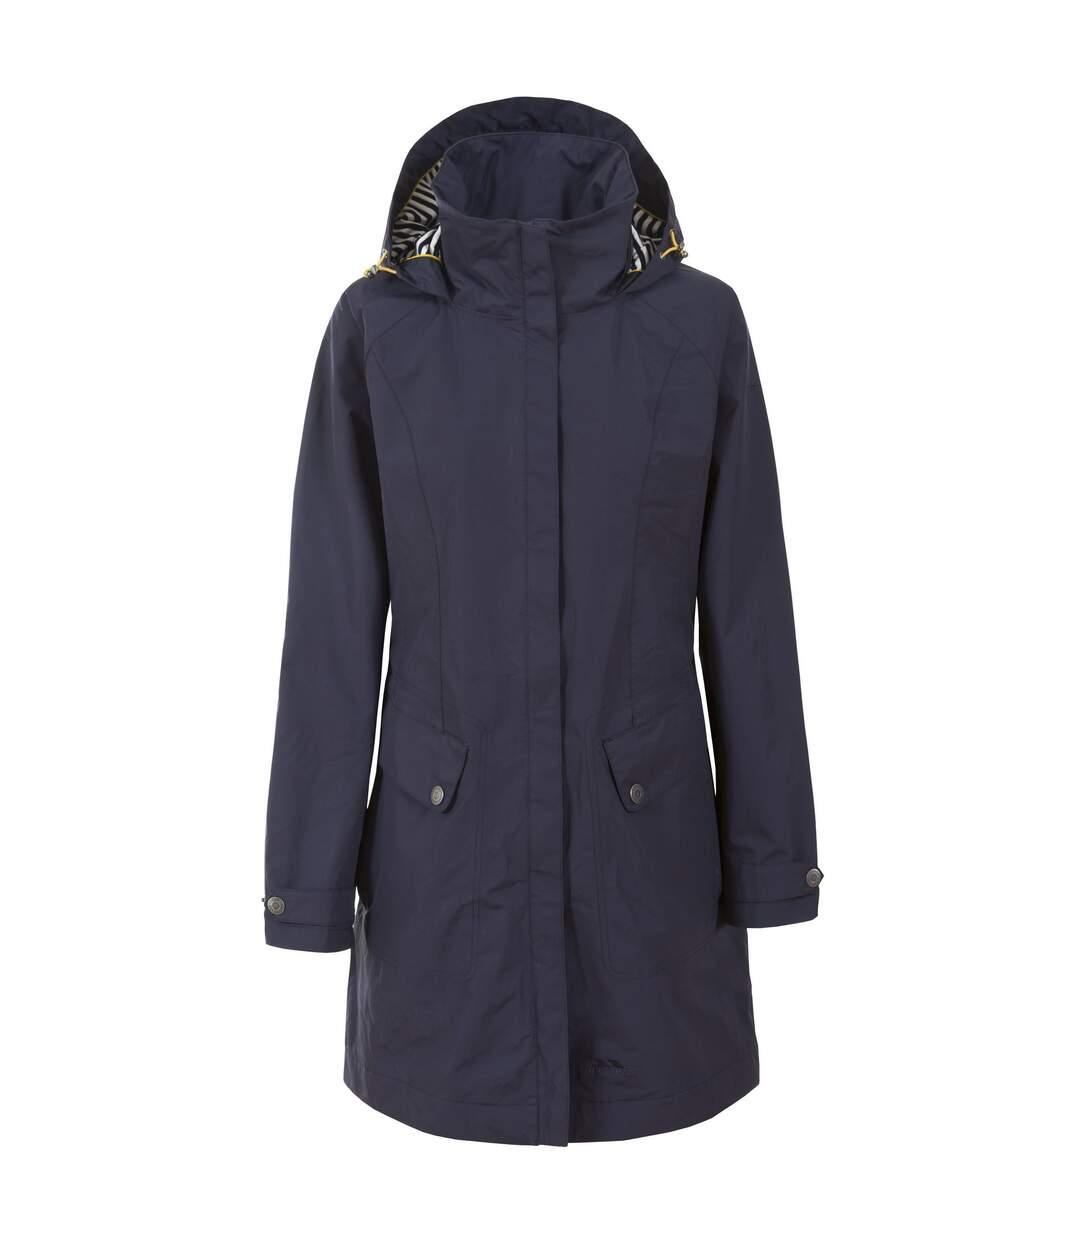 Trespass Womens/Ladies Rainy Day Waterproof Jacket (Fawn) - UTTP3613